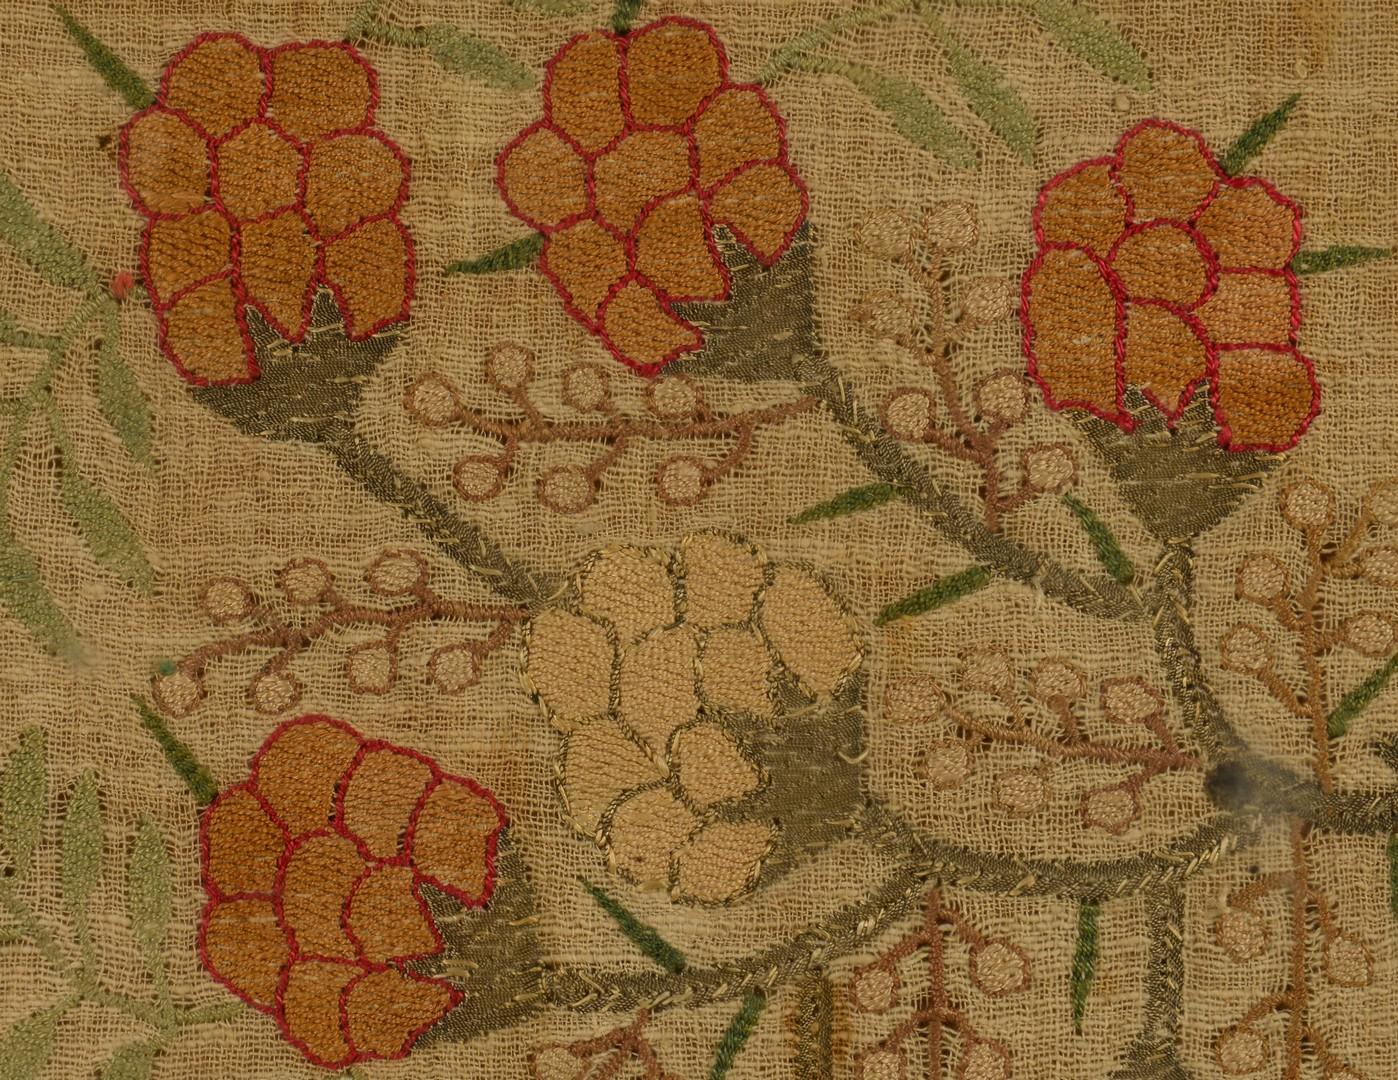 Lot 886: Early needlework textile